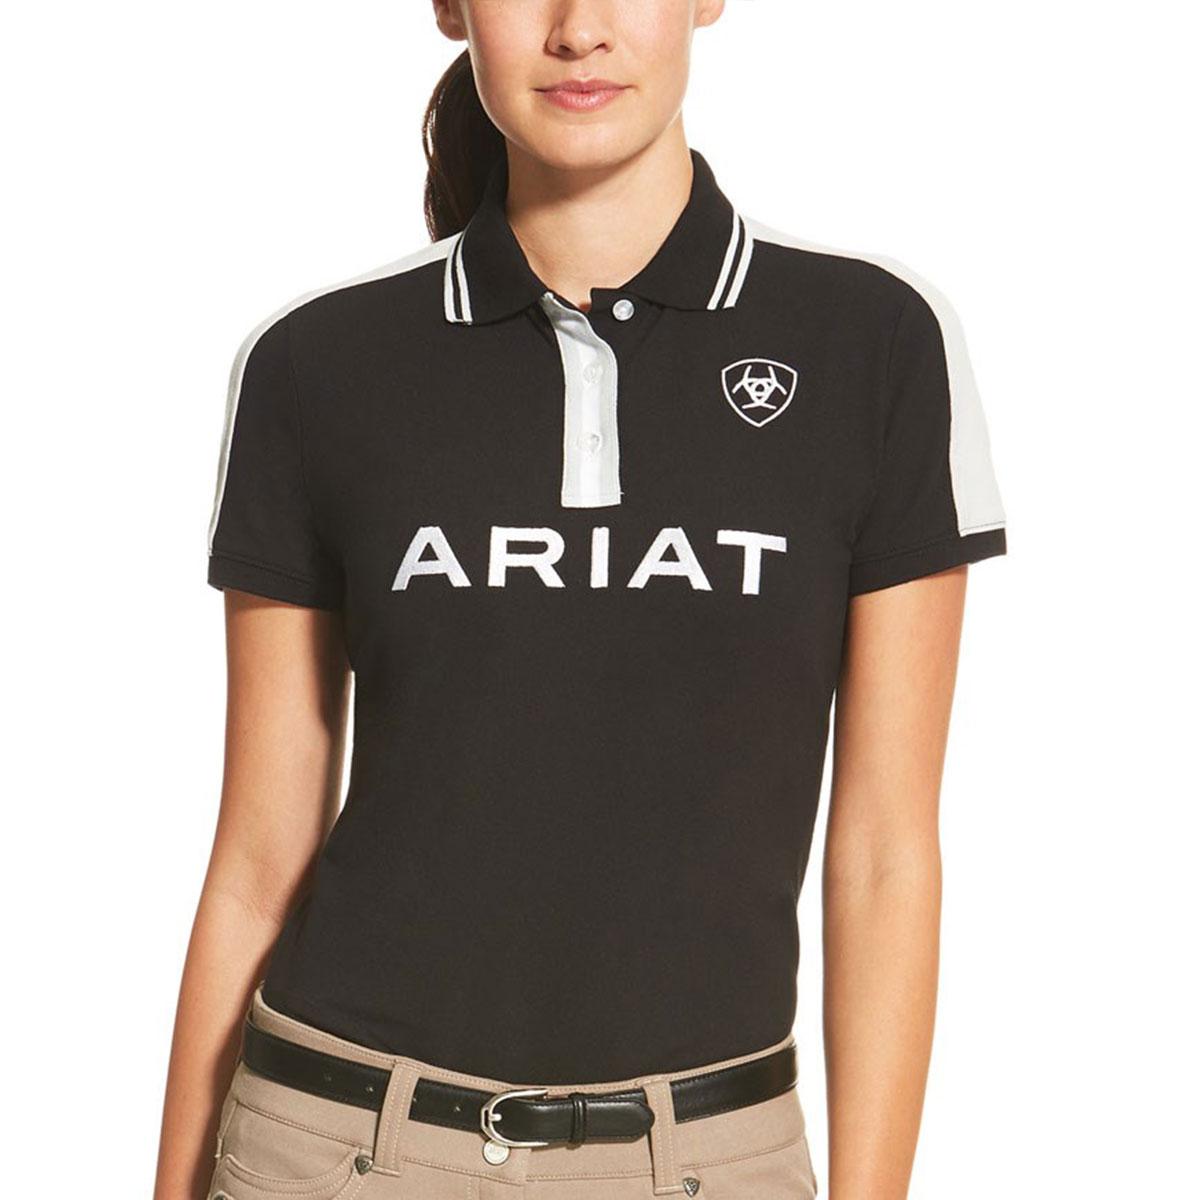 Ariat New Team Ladies Polo Shirt - Black